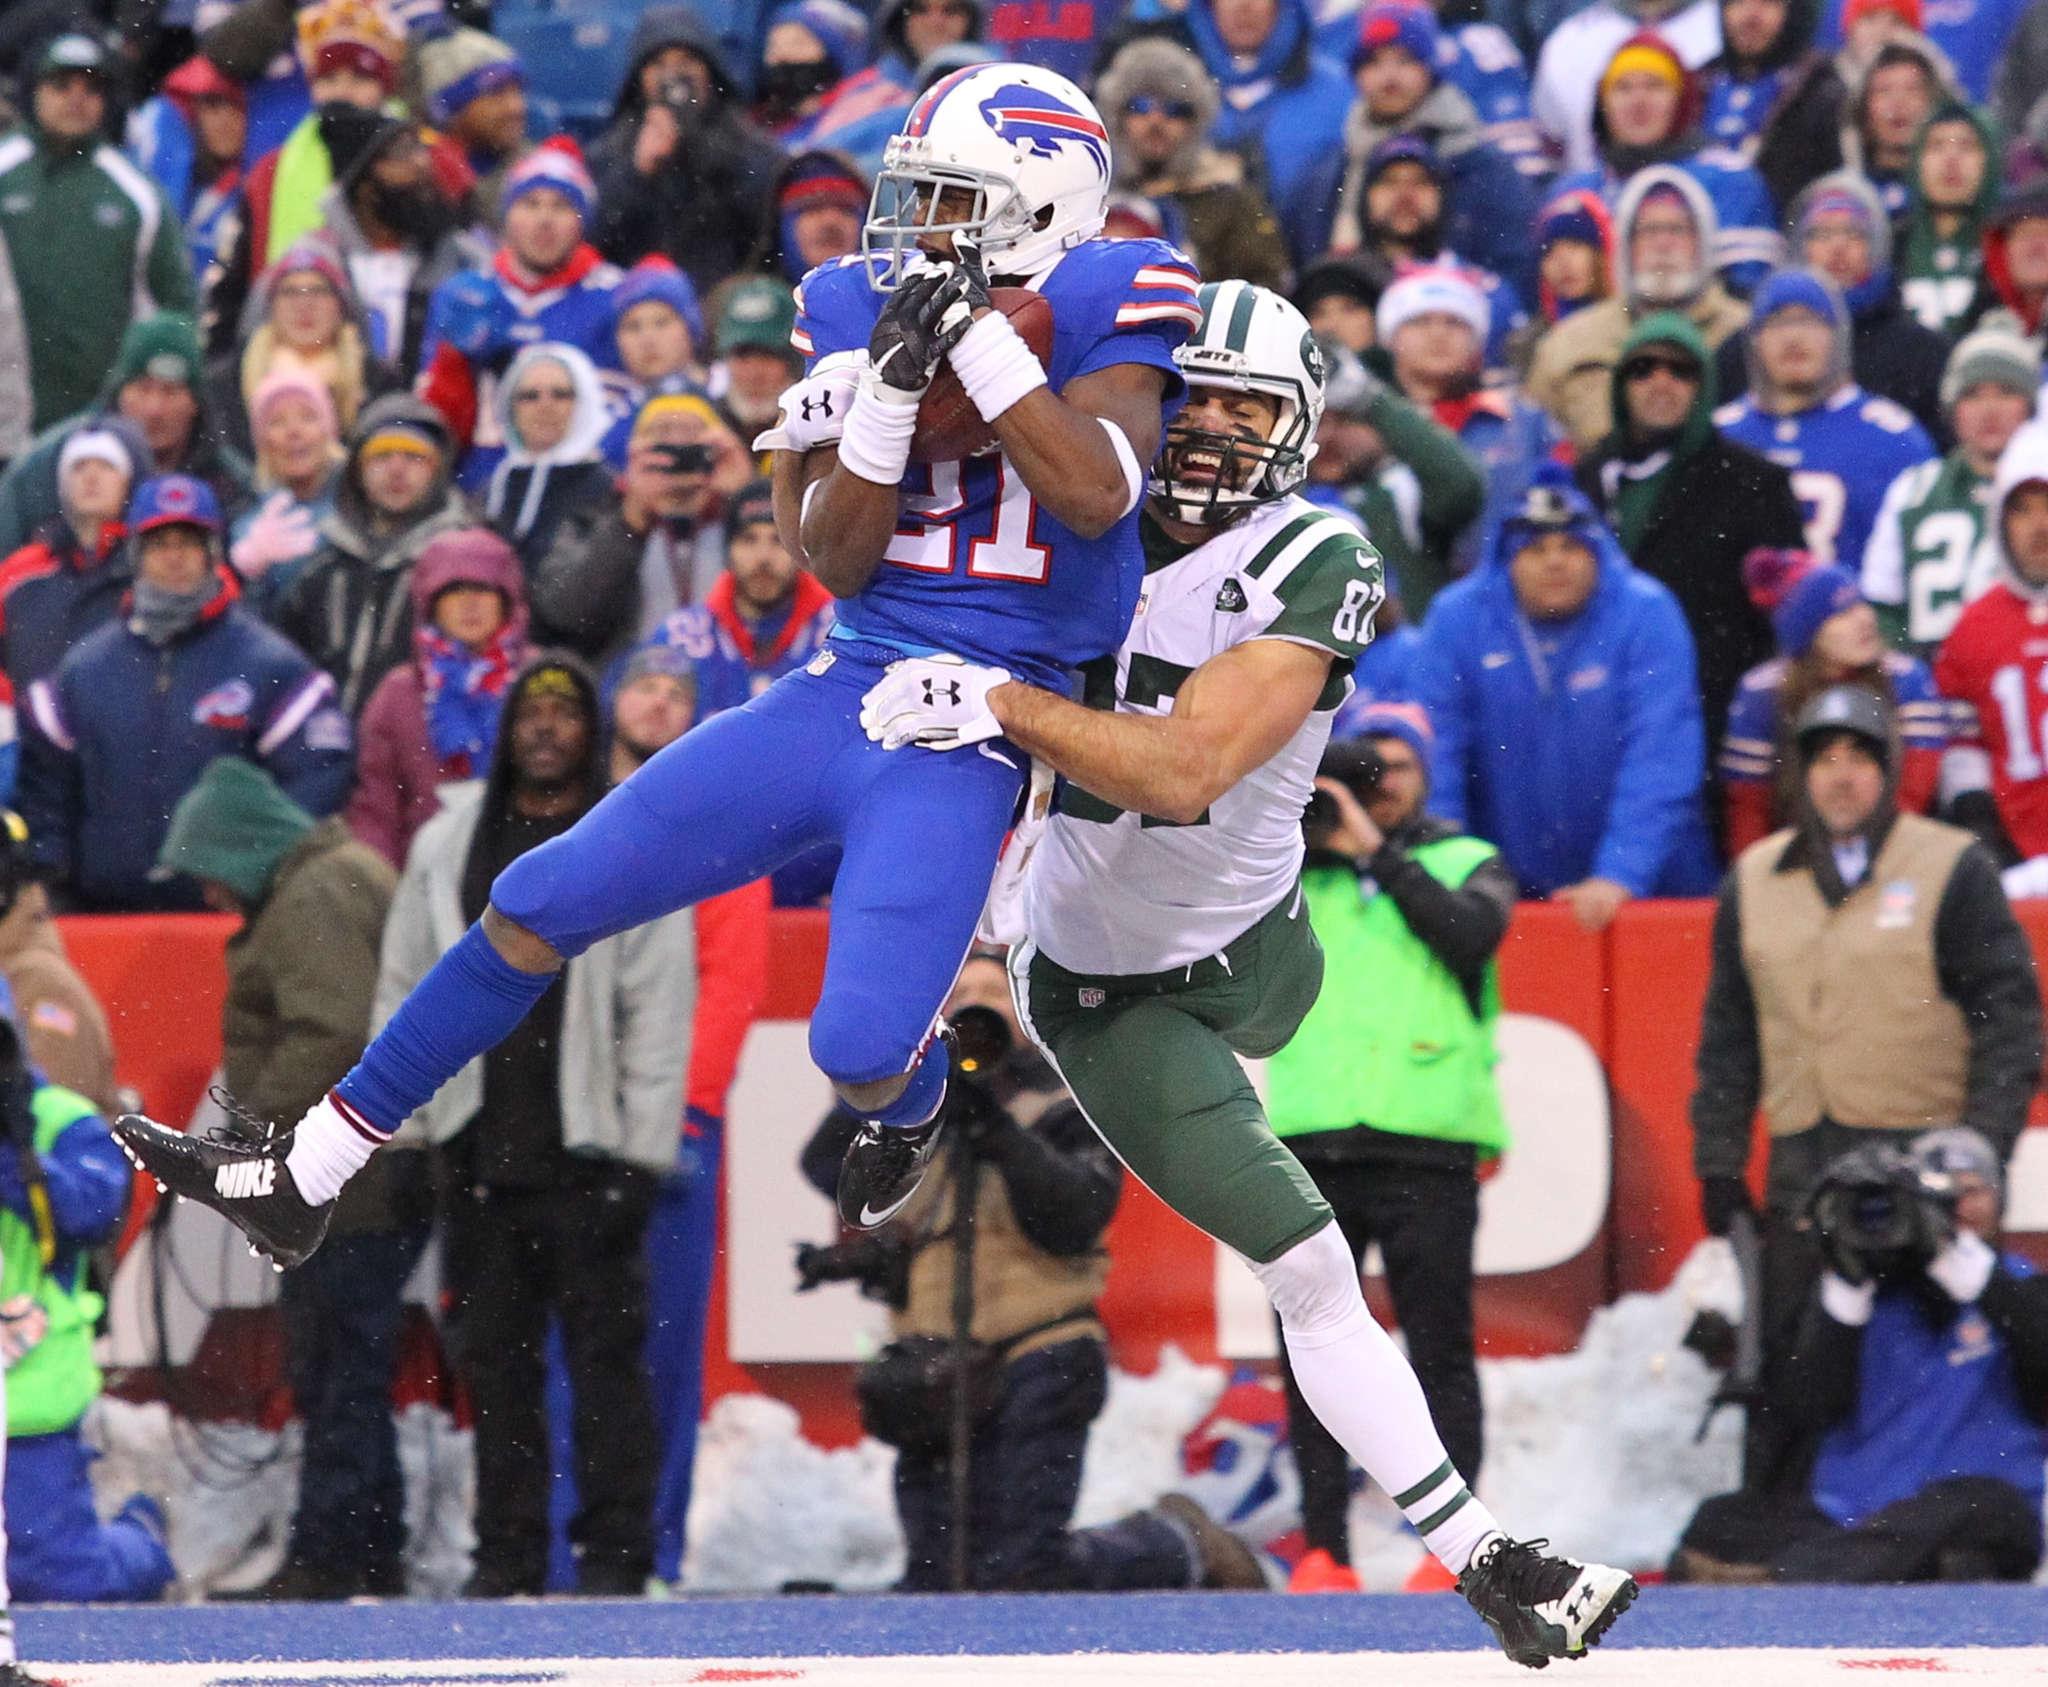 Leodis McKelvin intercepts a Jets pass in final game of the 2016 season. Associated Press